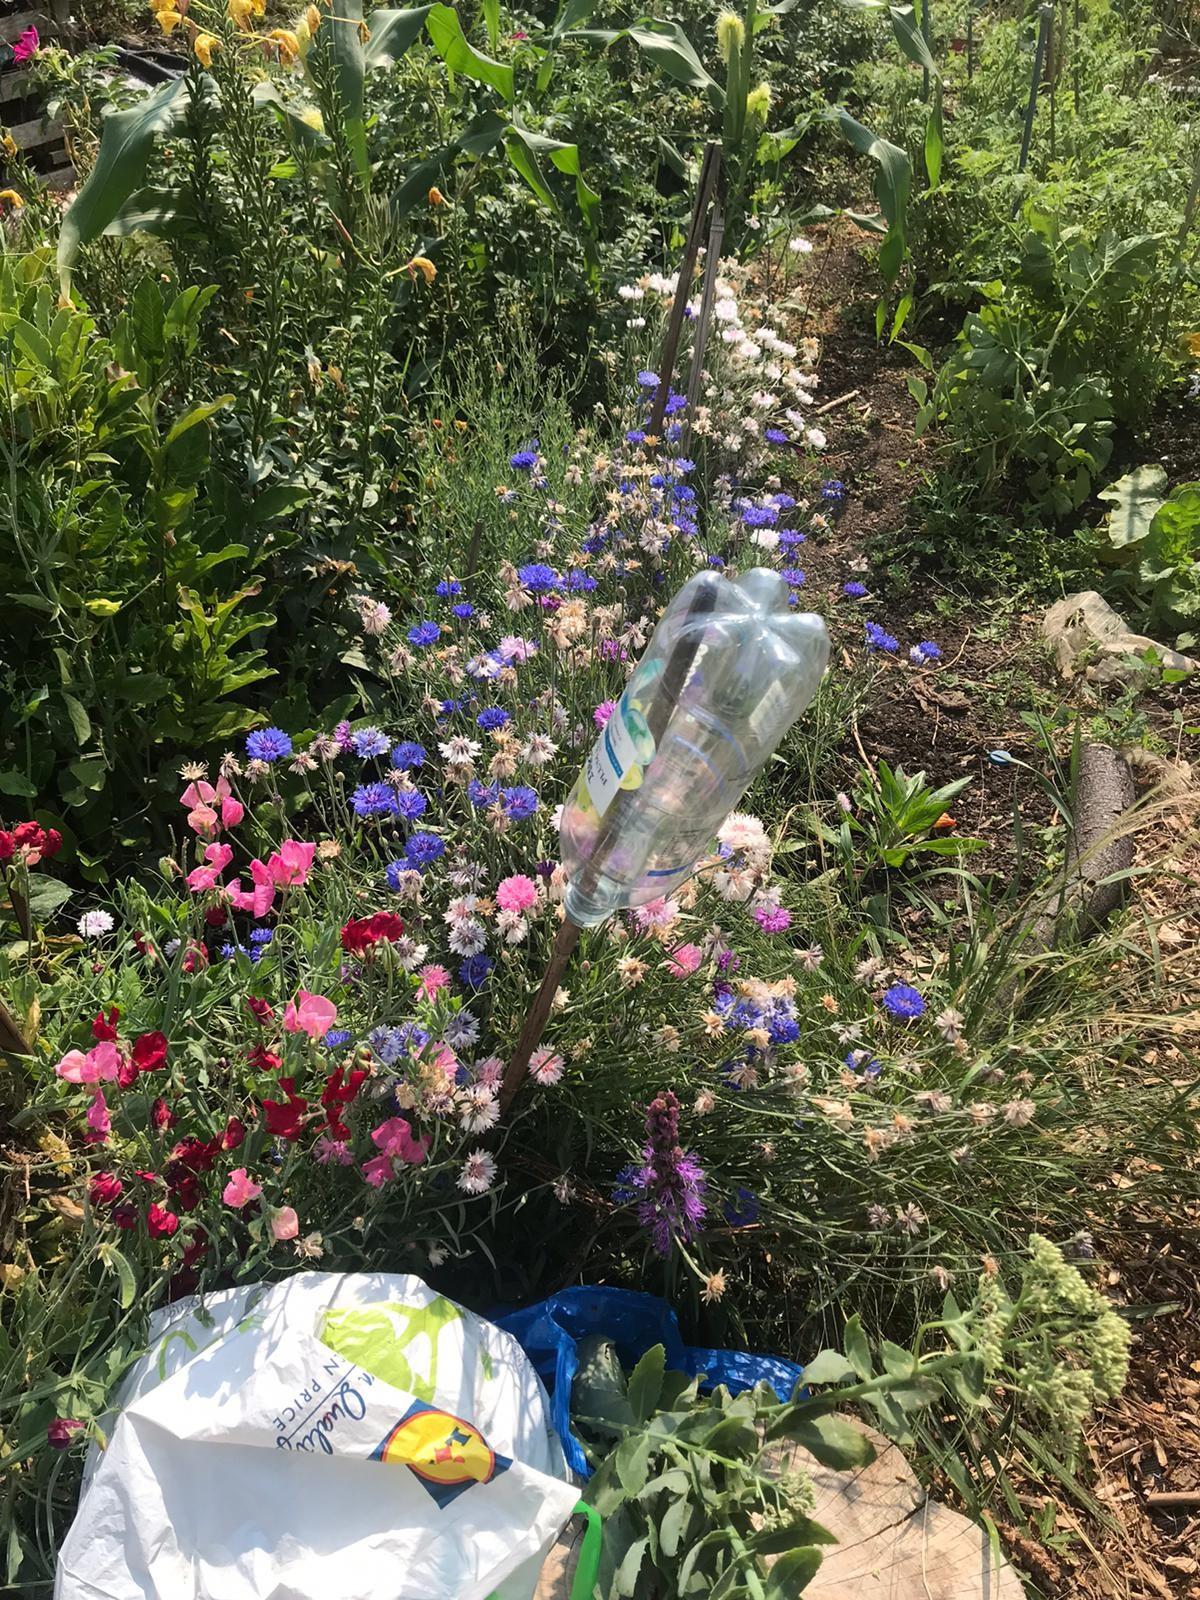 Best Mini Garden: Maureen at Calthorpe Project